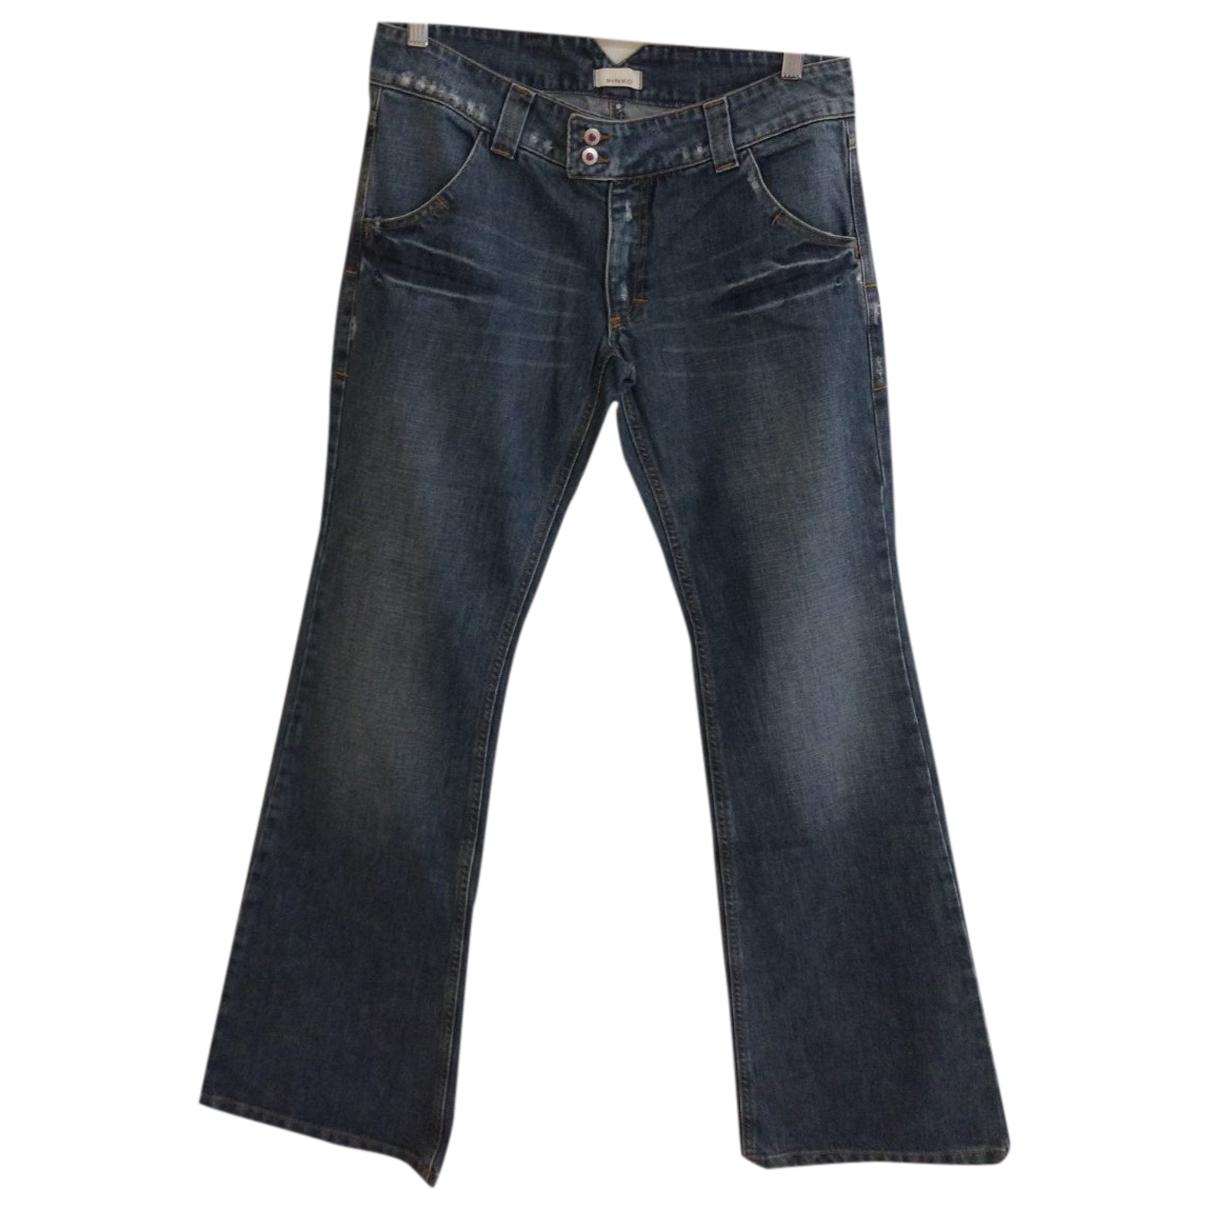 Pinko N Blue Denim - Jeans Jeans for Women 31 US